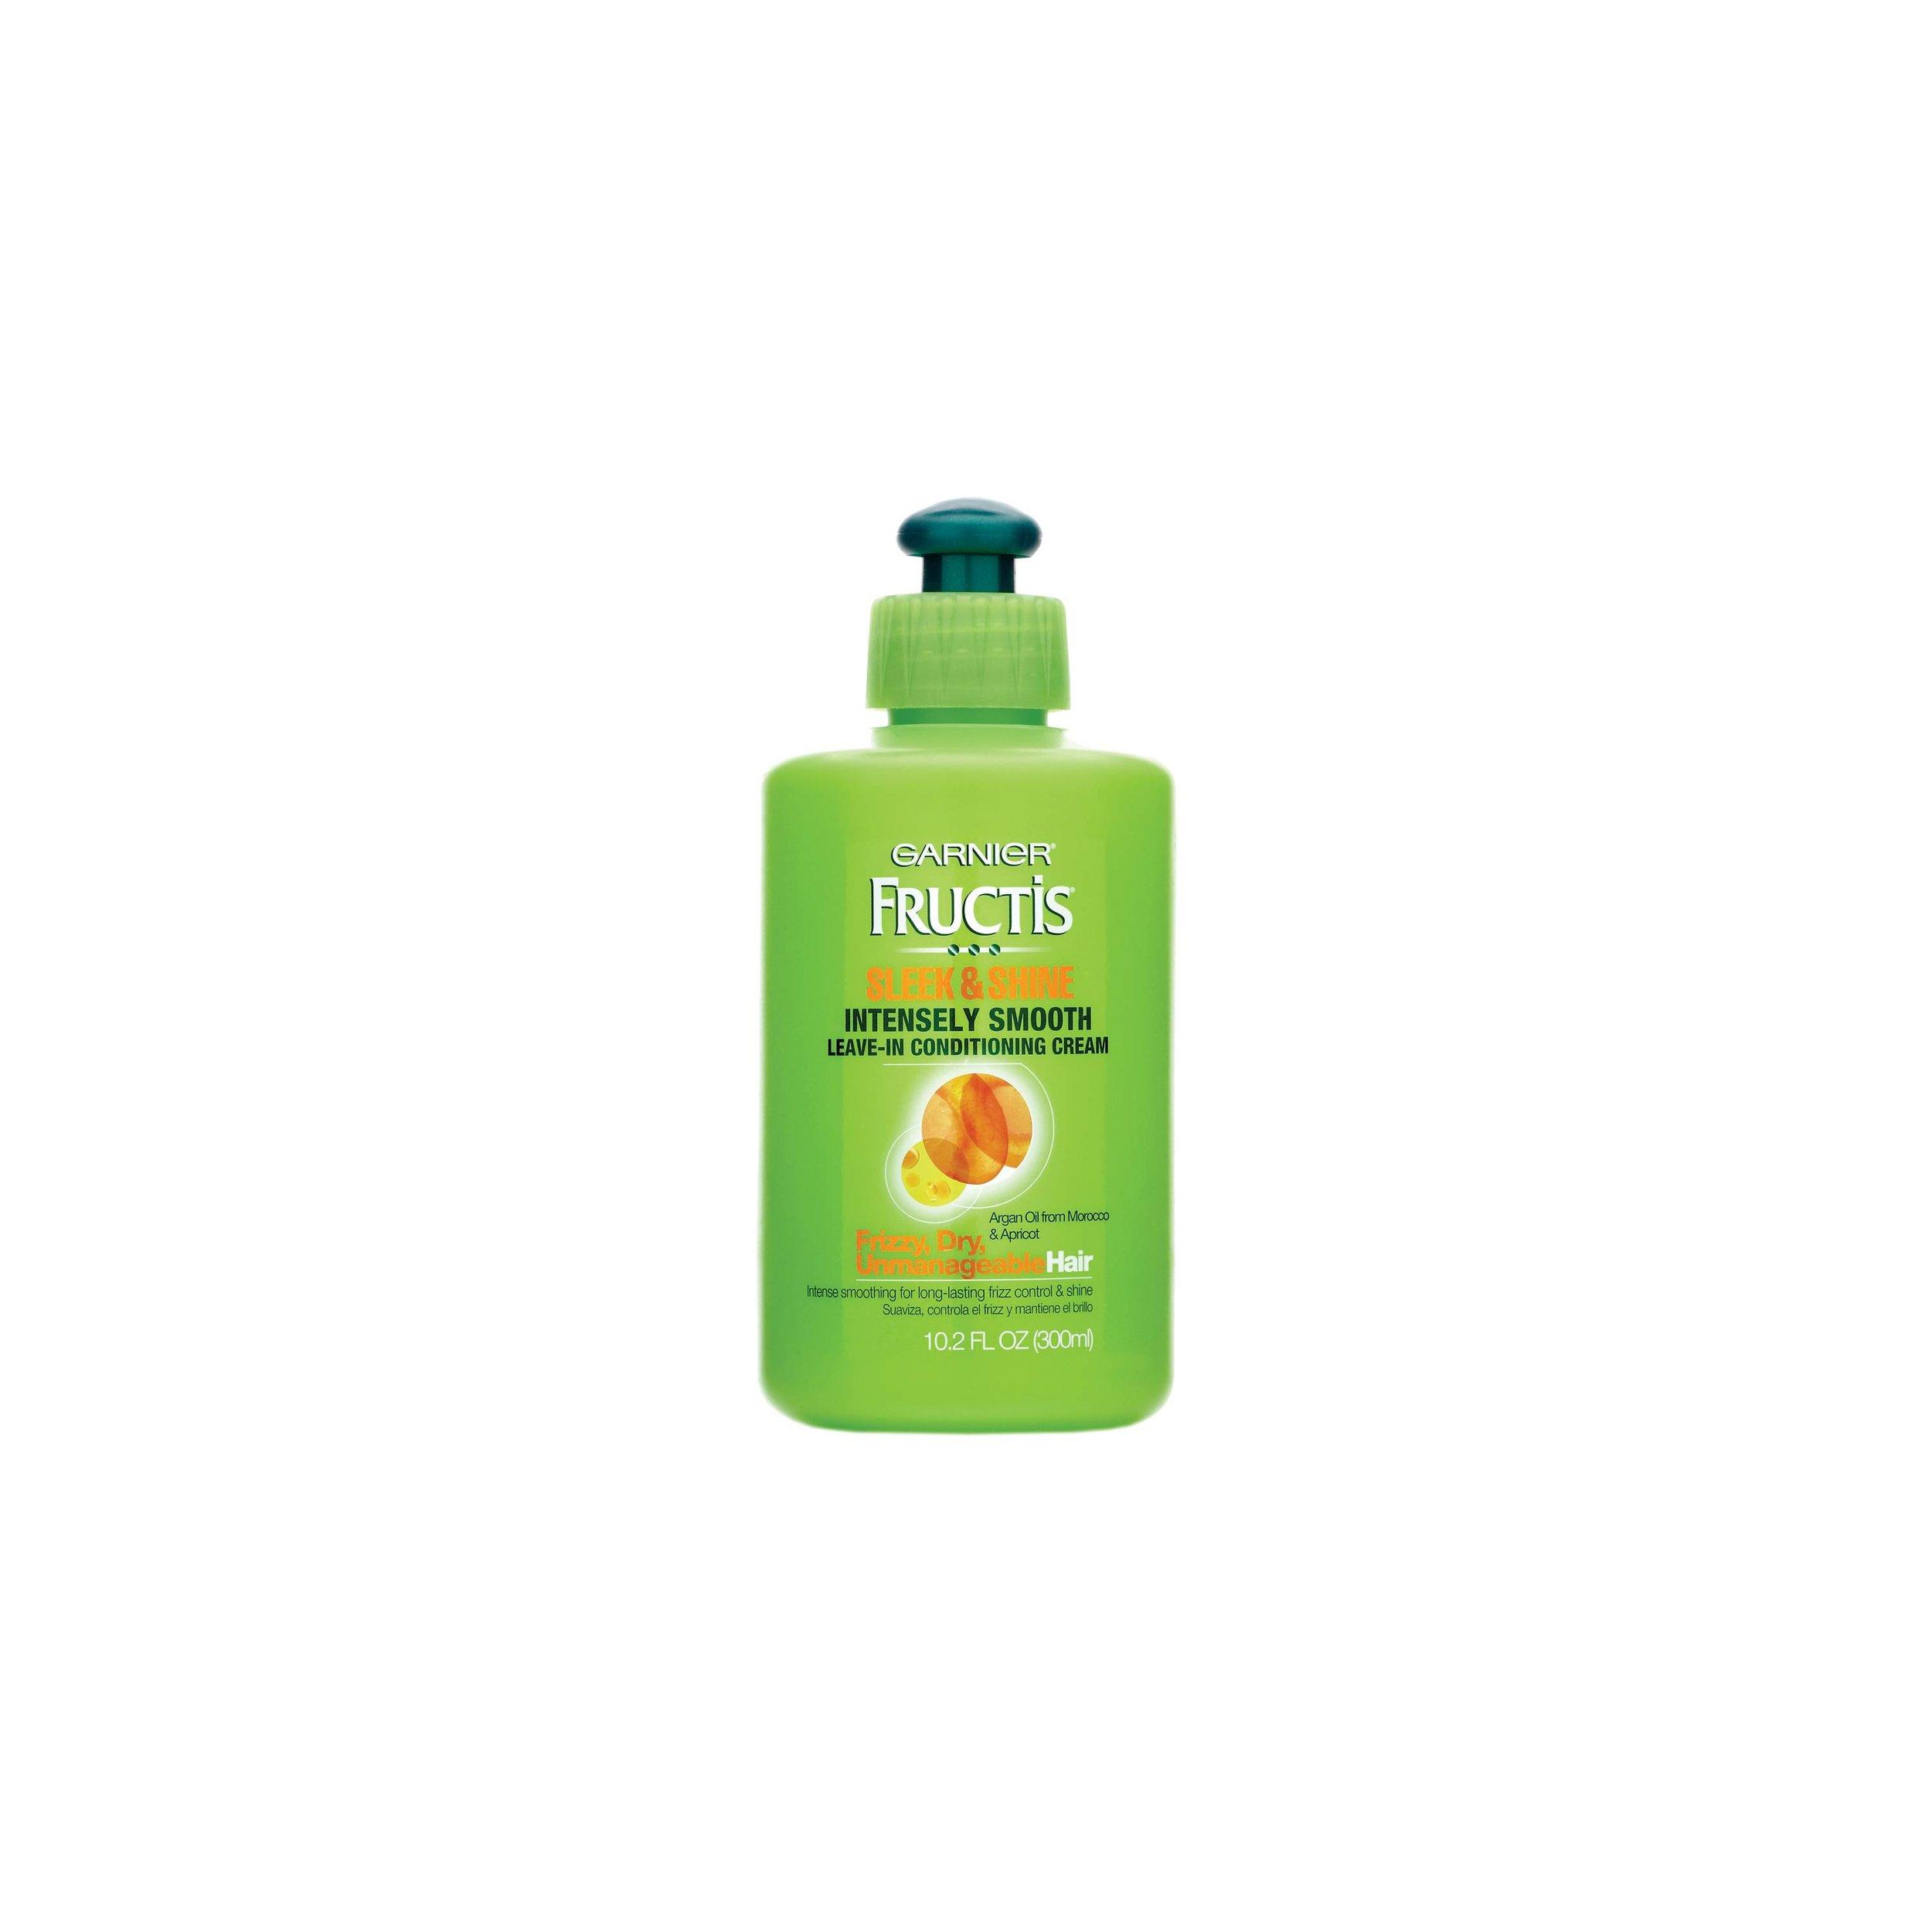 Garnier Sleek & Shine Intensely Smooth Leave-In Conditioning Cream ($4)